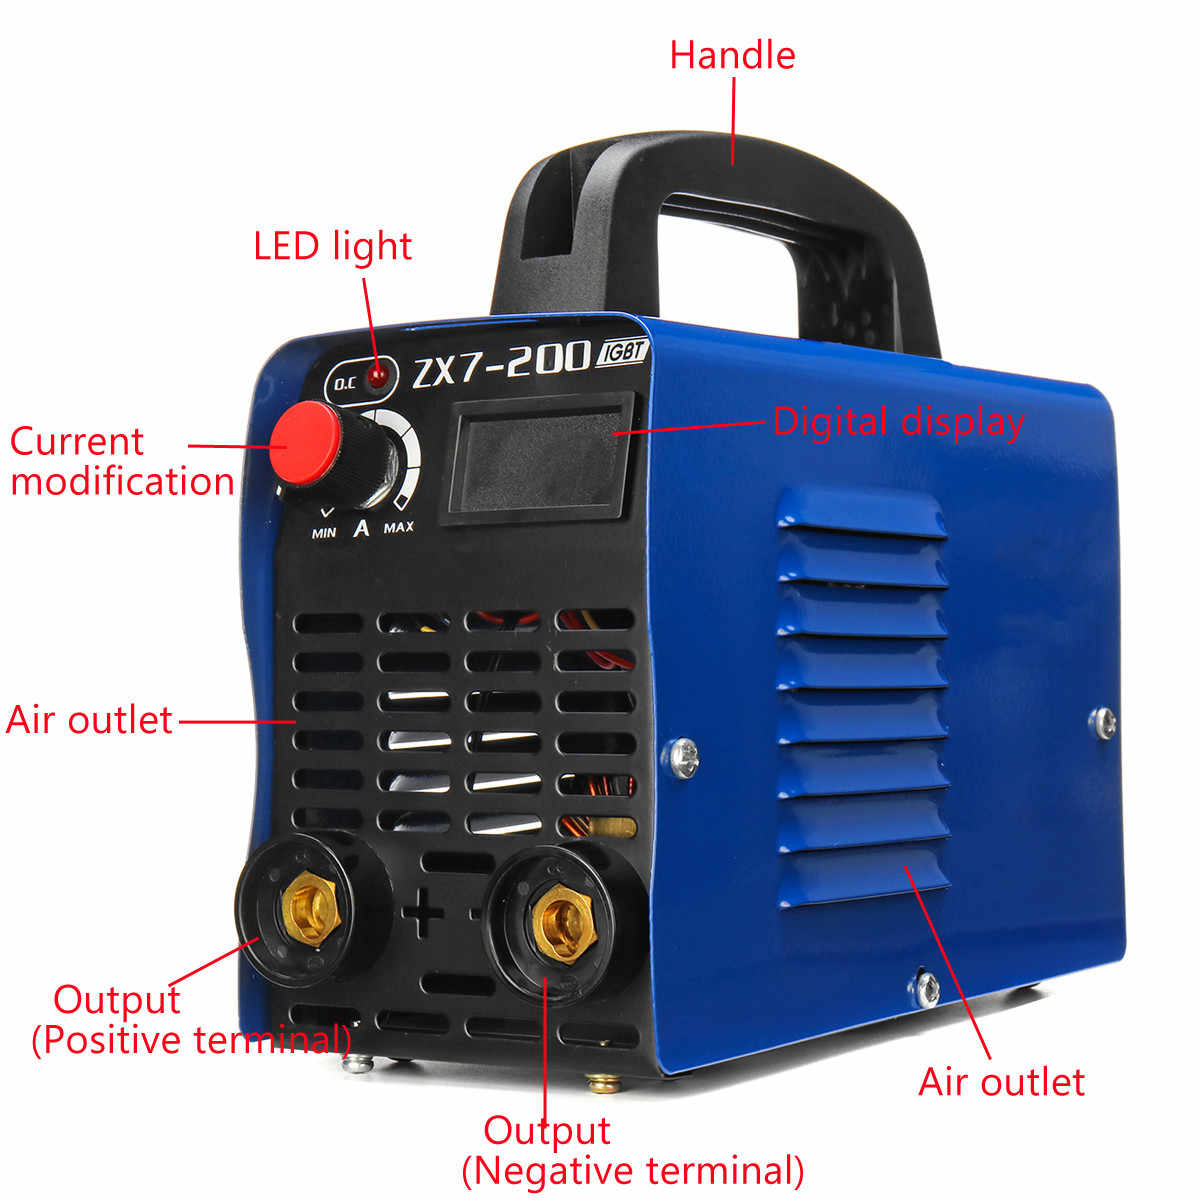 4000 W 20A-200A Pantalla LCD portátil Mini IGBT inversor máquina de soldadura eléctrica soldadora de arco de alta frecuencia inversor máquina herramienta